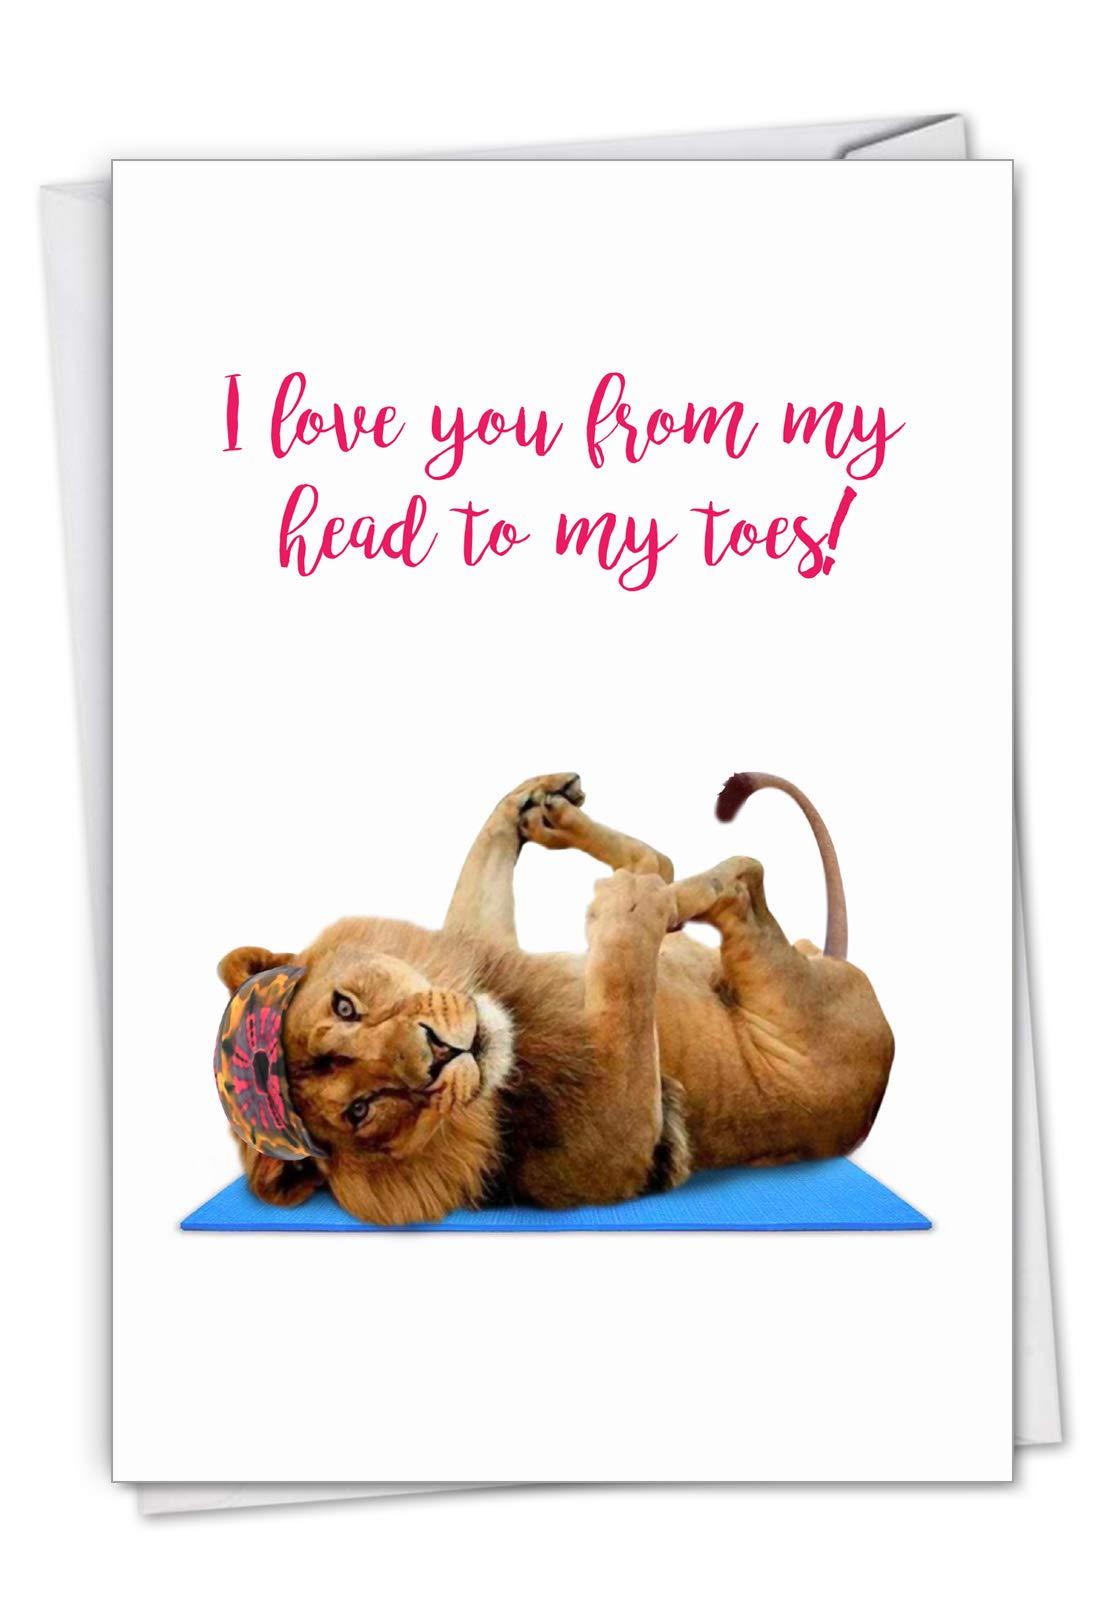 Wildlife Yoga Lion - Cute Happy Birthday Greeting Card with Envelope (4.63 x 6.75 Inch) - Cute Zoo Animal Yoga, Bday Note Card for Birthdays - Gym, Workout Stationery, Fun Bday Notecard C7030EBDG